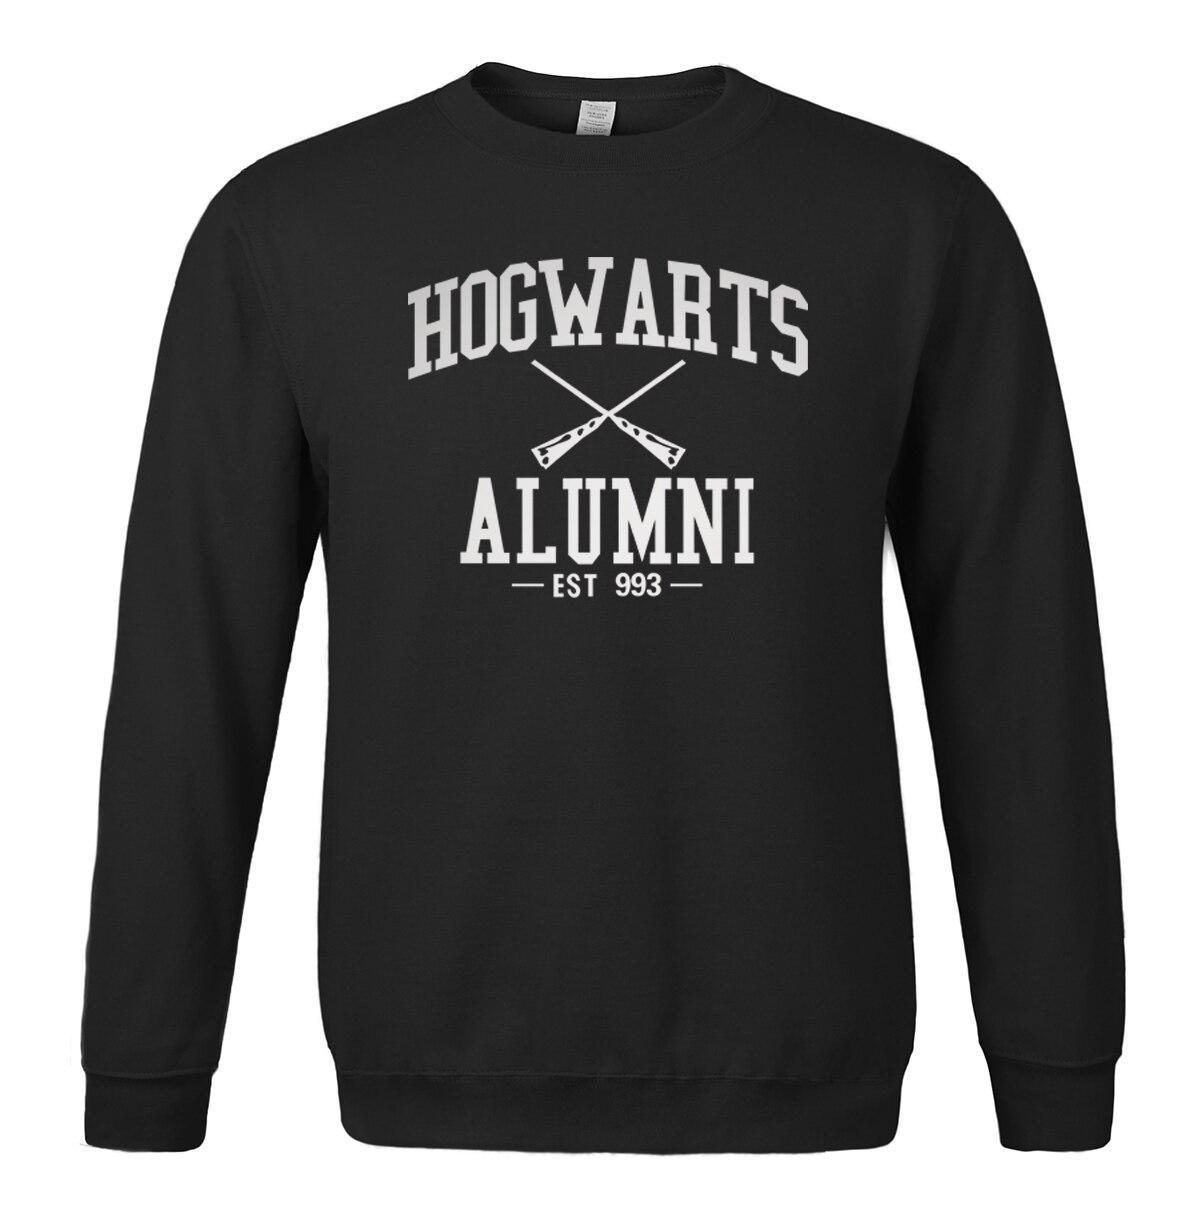 Sweatshirt men 2019 spring winter Hogwarts Alumni print O-neck hoodies brand-clothing men's sportswear harajuku k-pop tracksuits